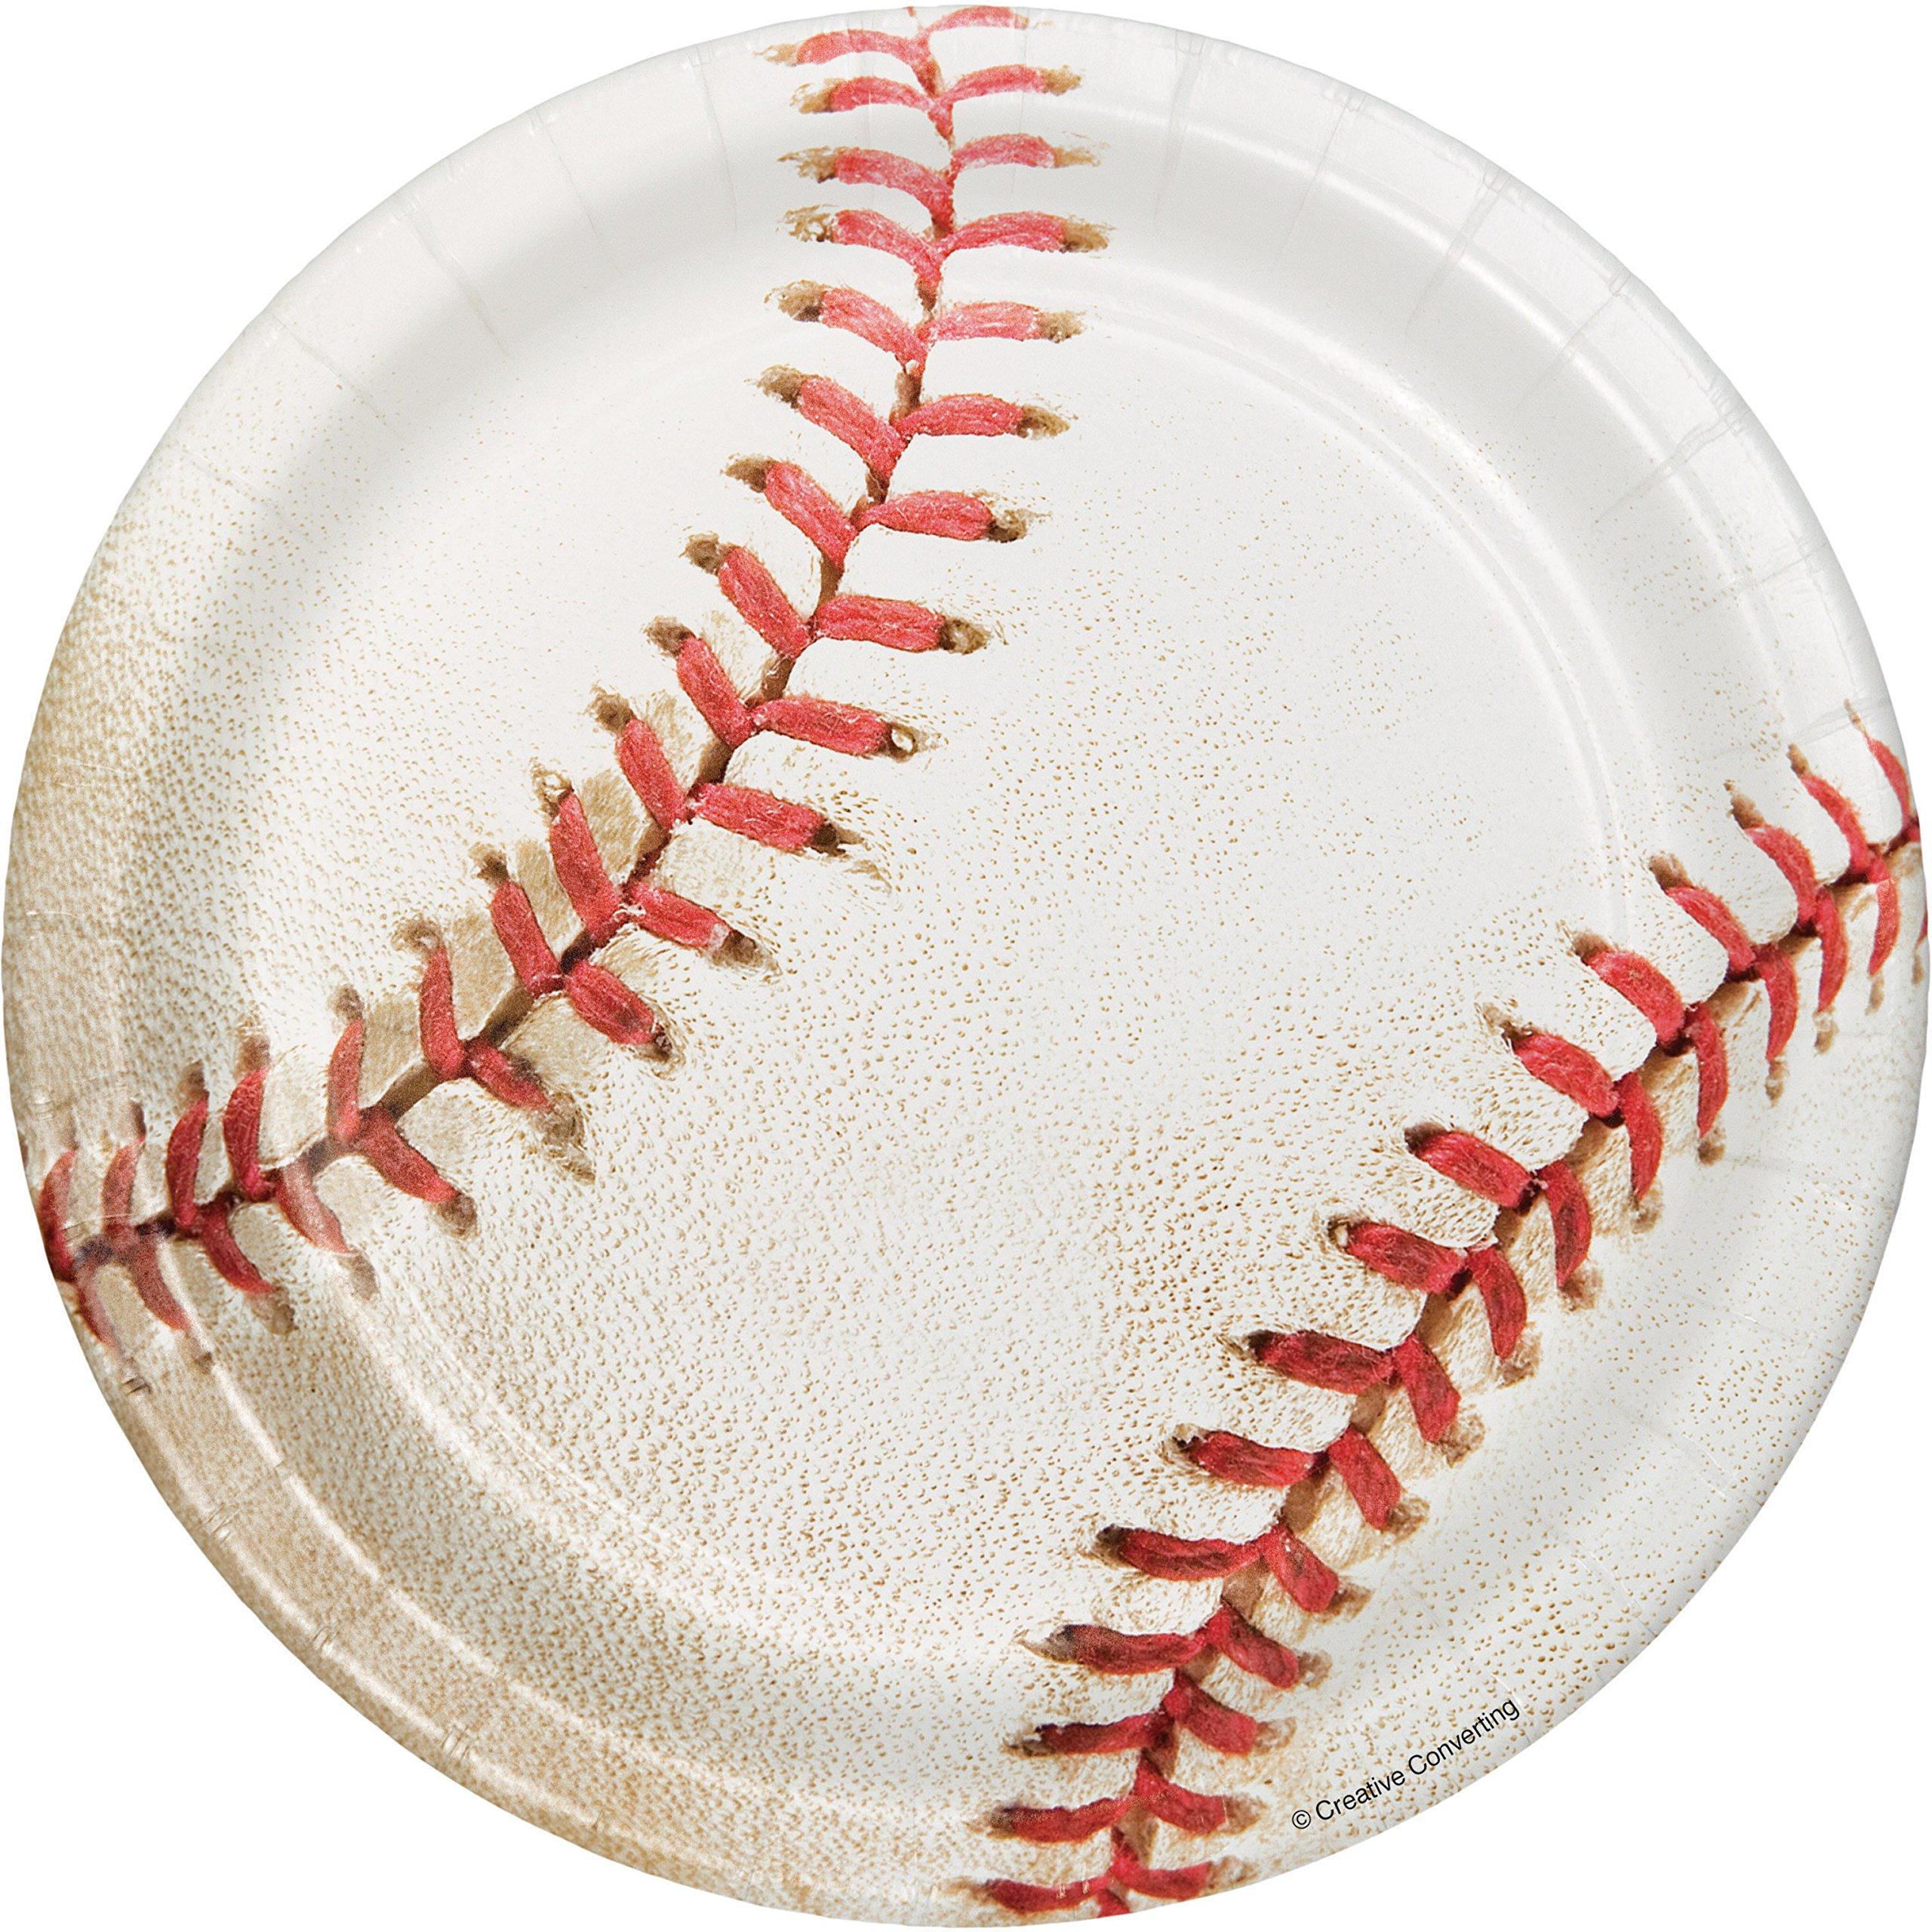 Baseball Dessert Plates, 24 ct by Creative Converting